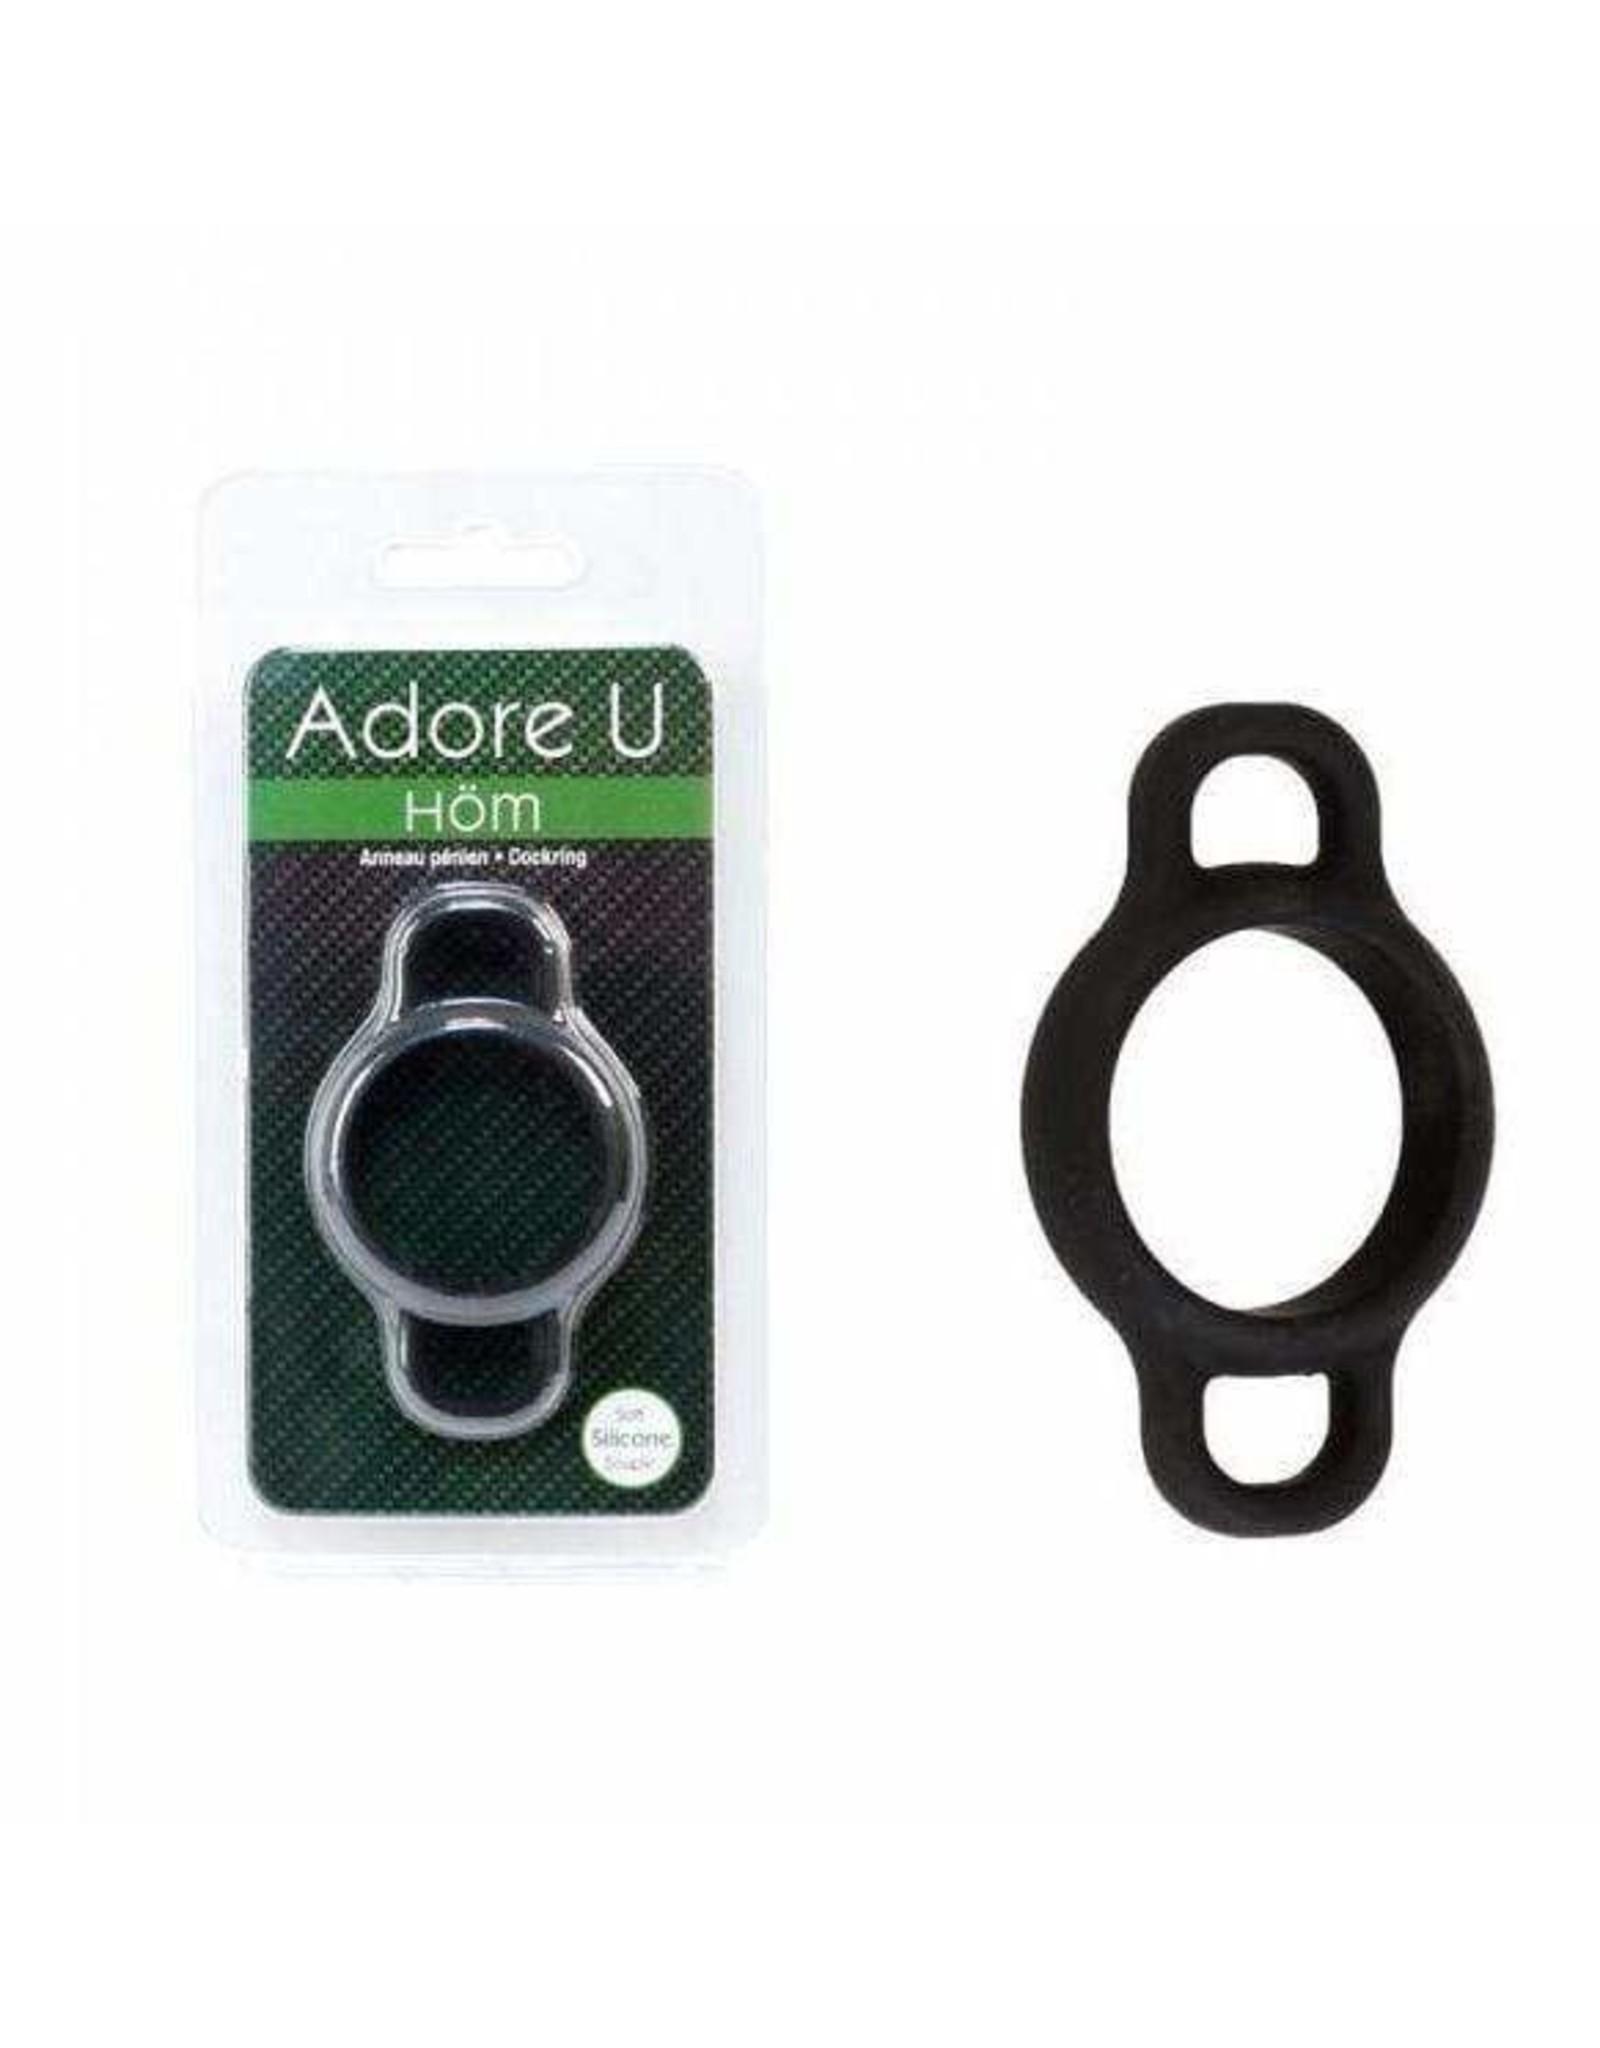 Adore U Hom - Cockring